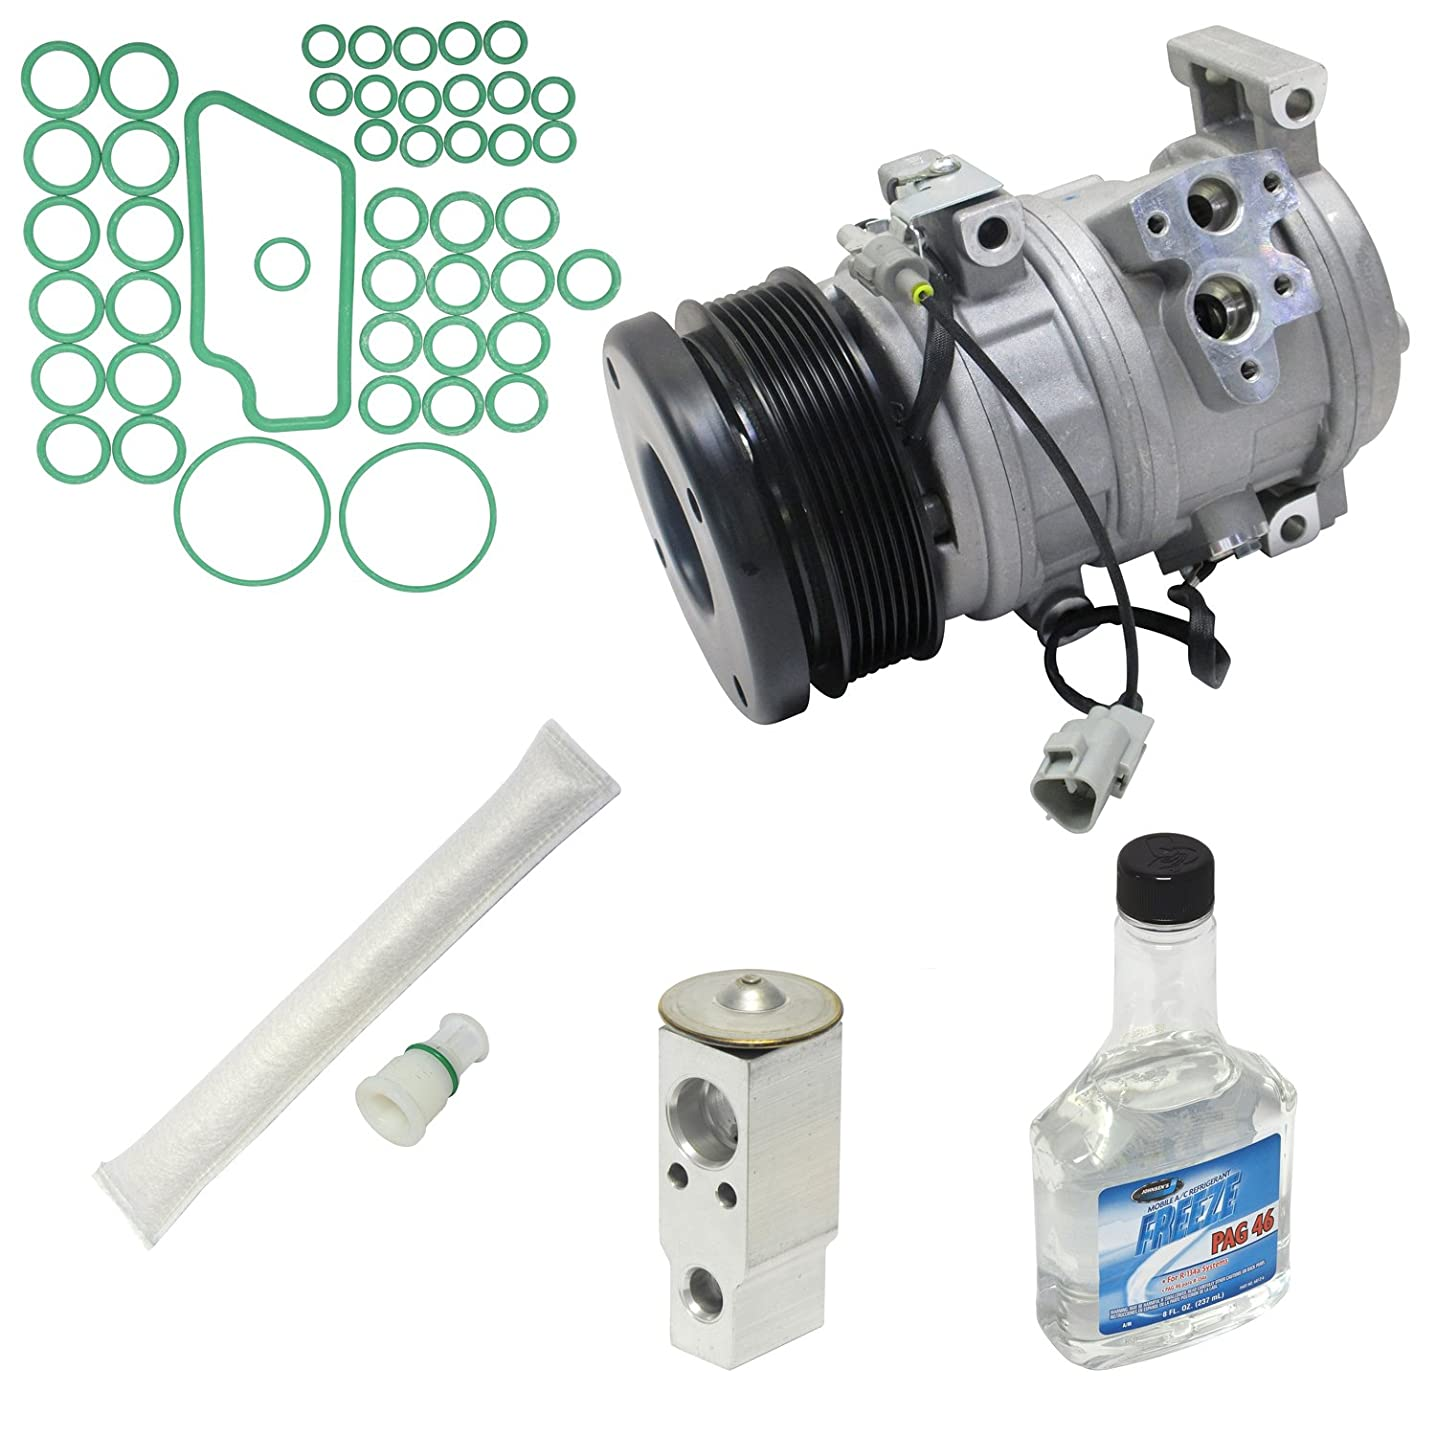 Universal Air Conditioner KT 4068 A/C Compressor/Component Kit